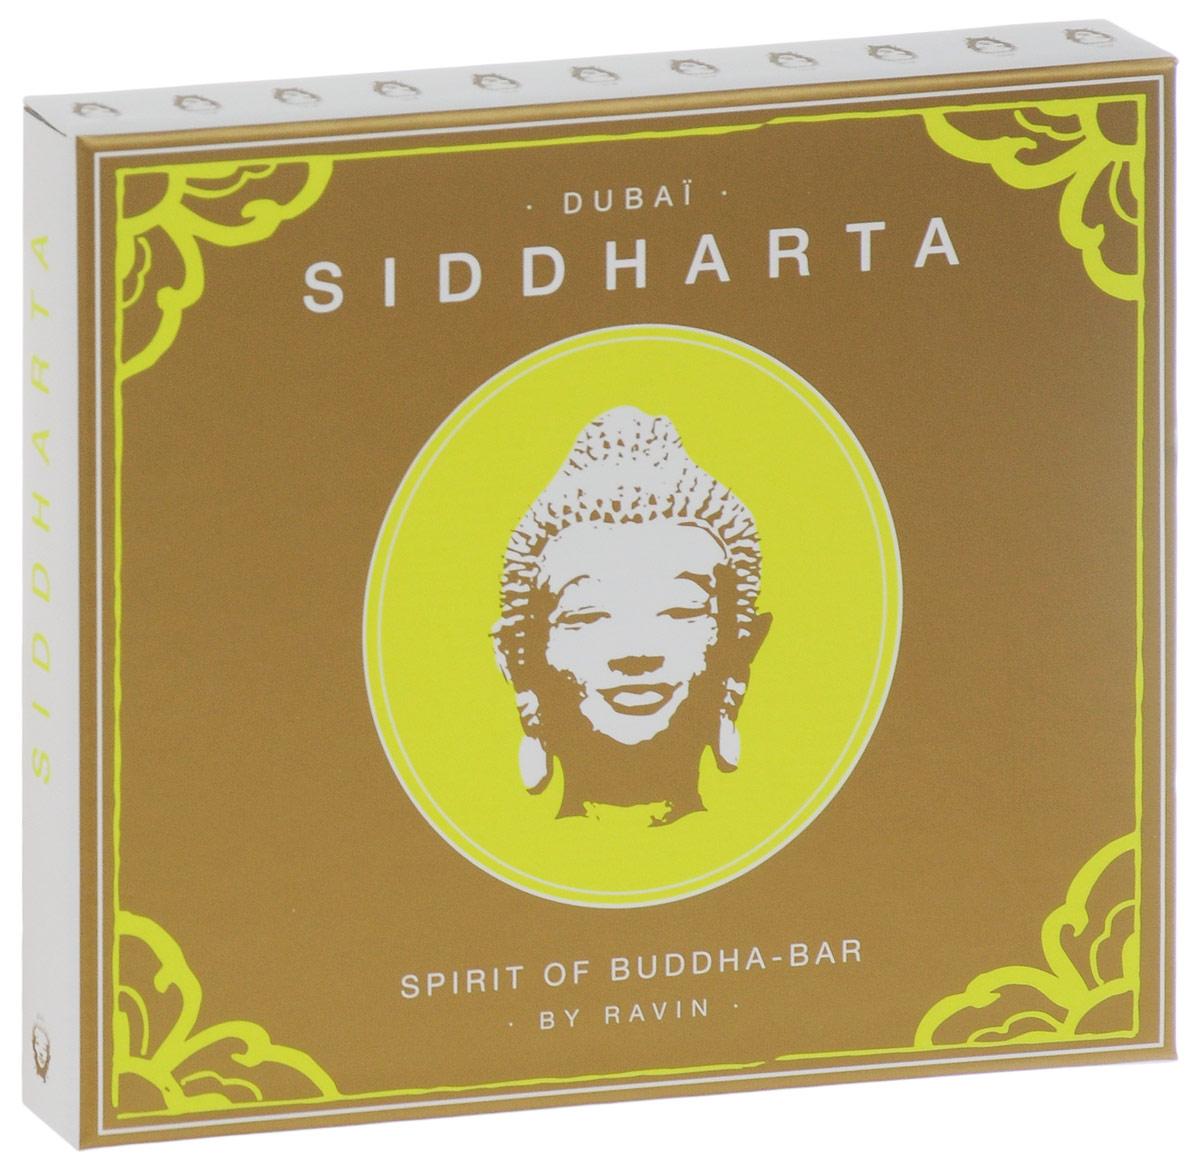 Ravin. Dubai. Siddharta. Spirit Of Buddha-Bar 2012 Audio CD